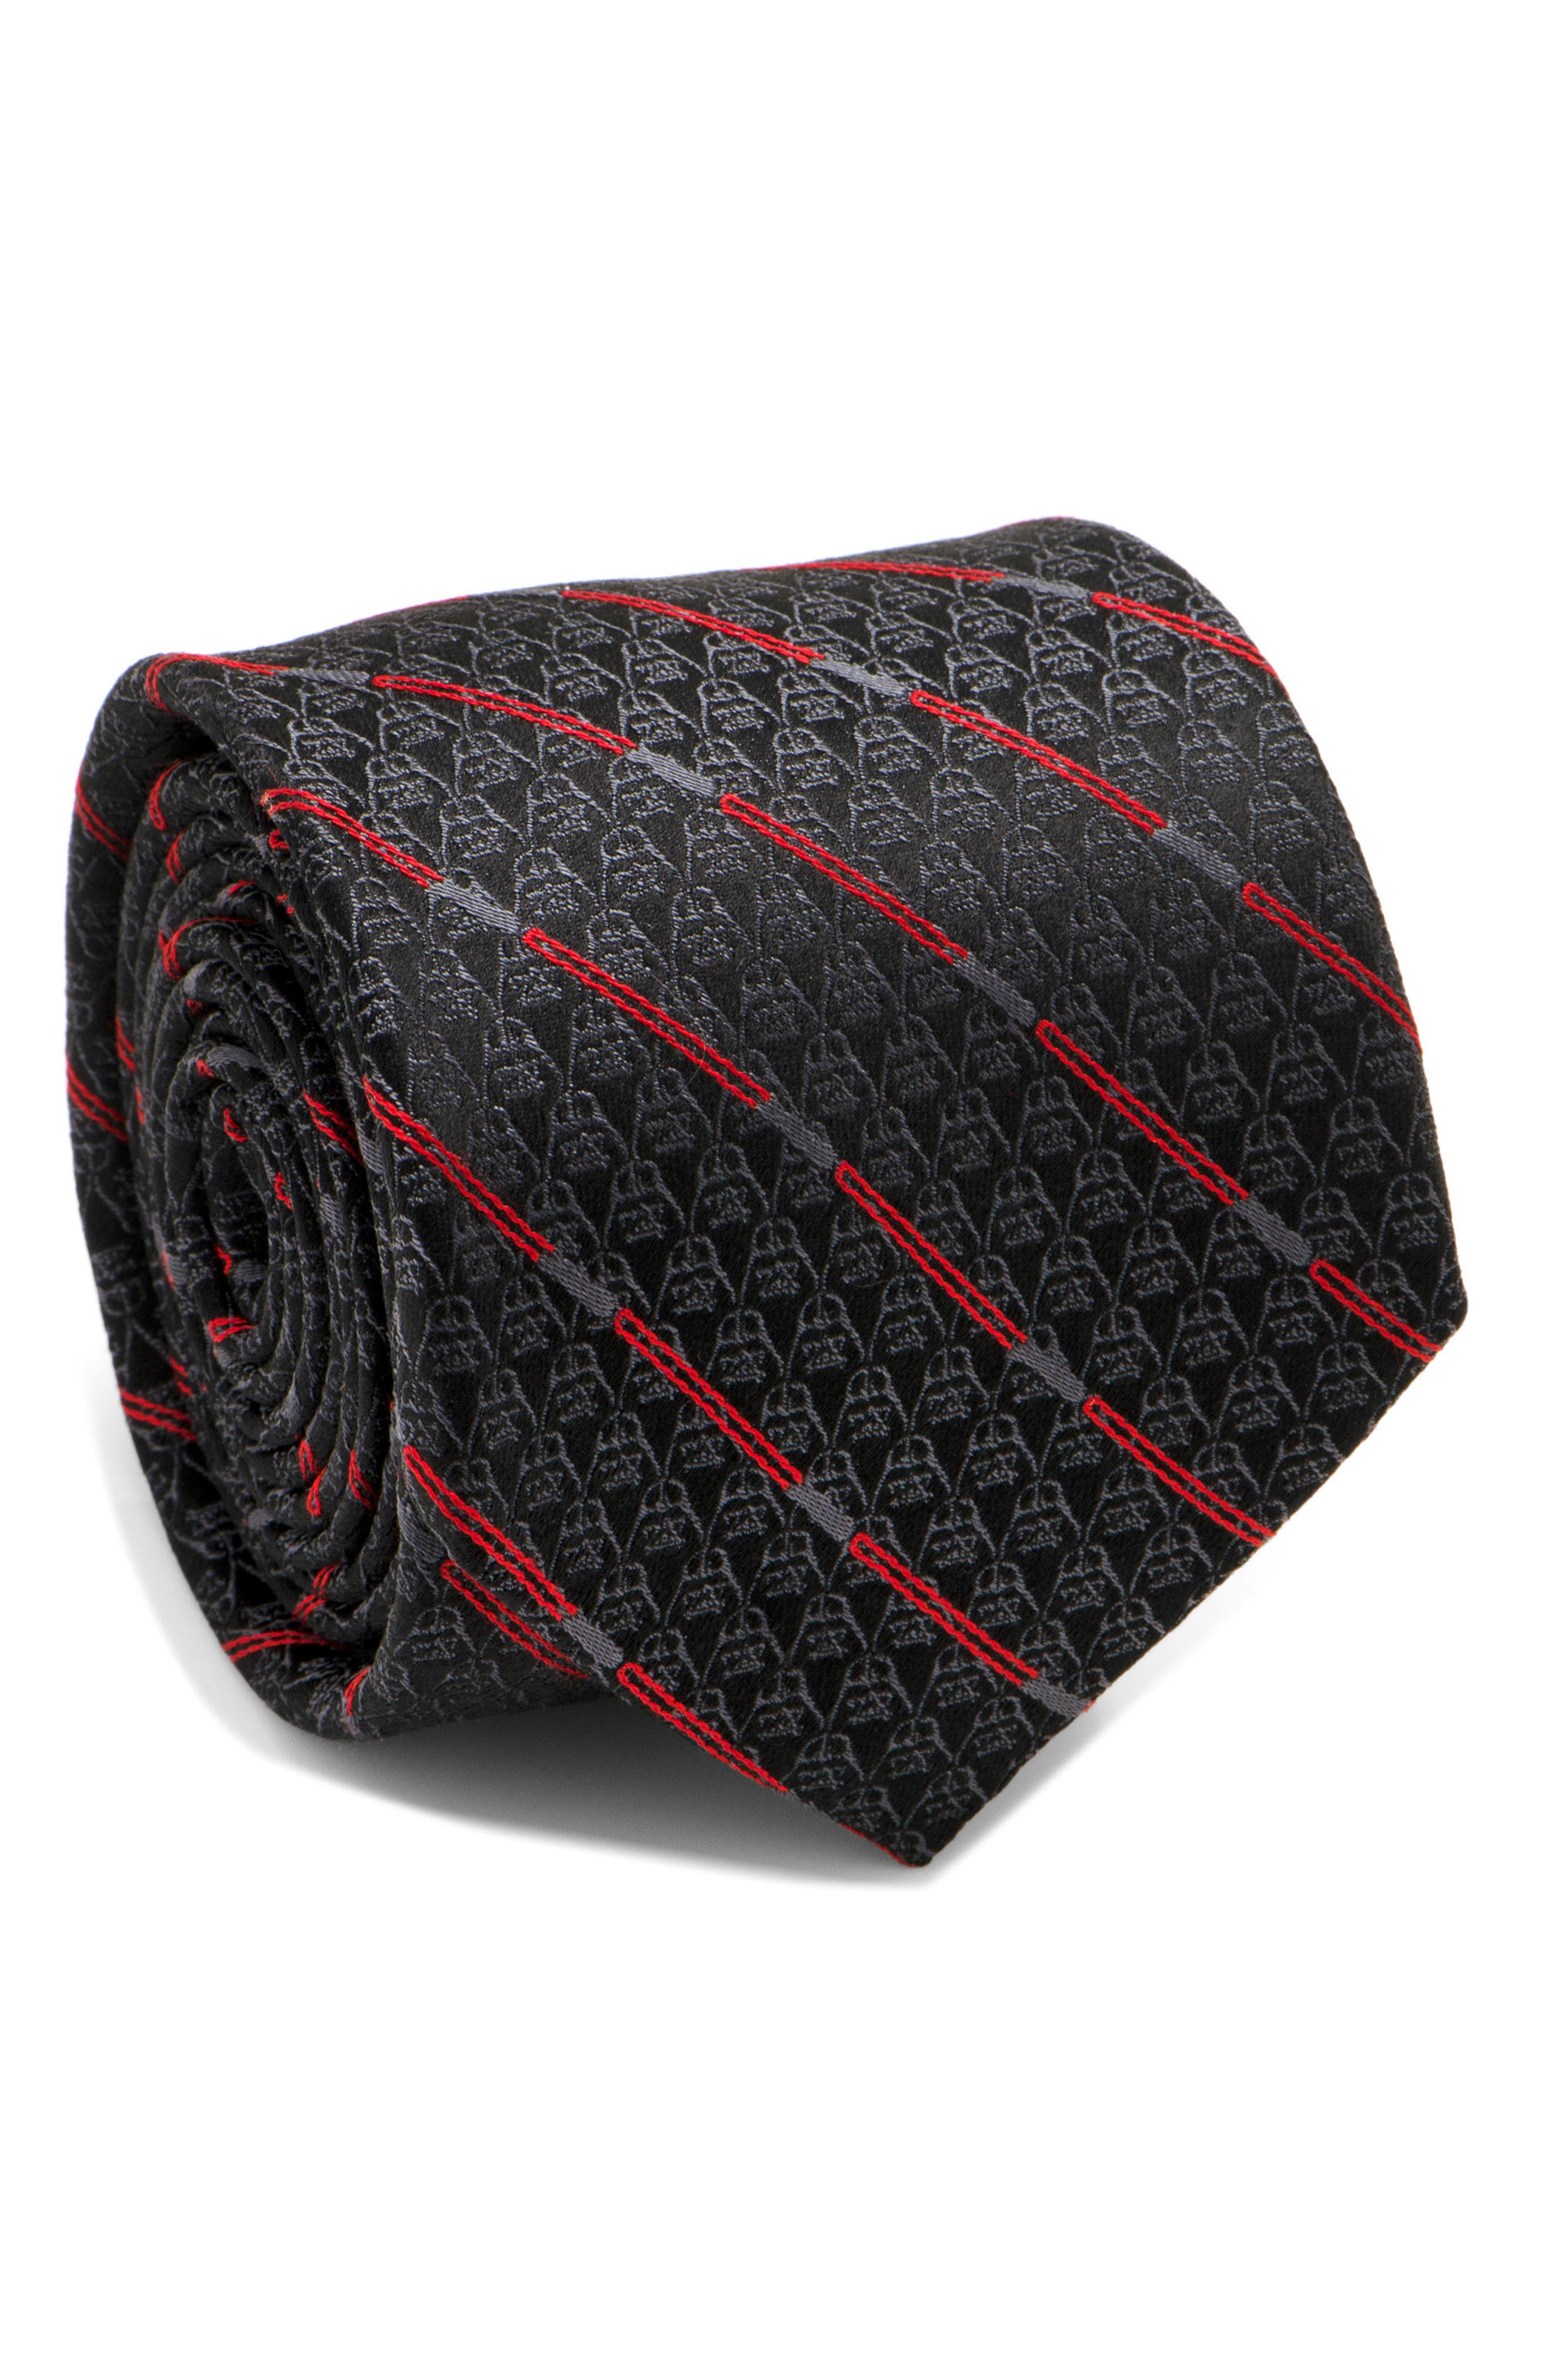 Cufflinks Inc. Darth Vader Light Saber Silk Tie